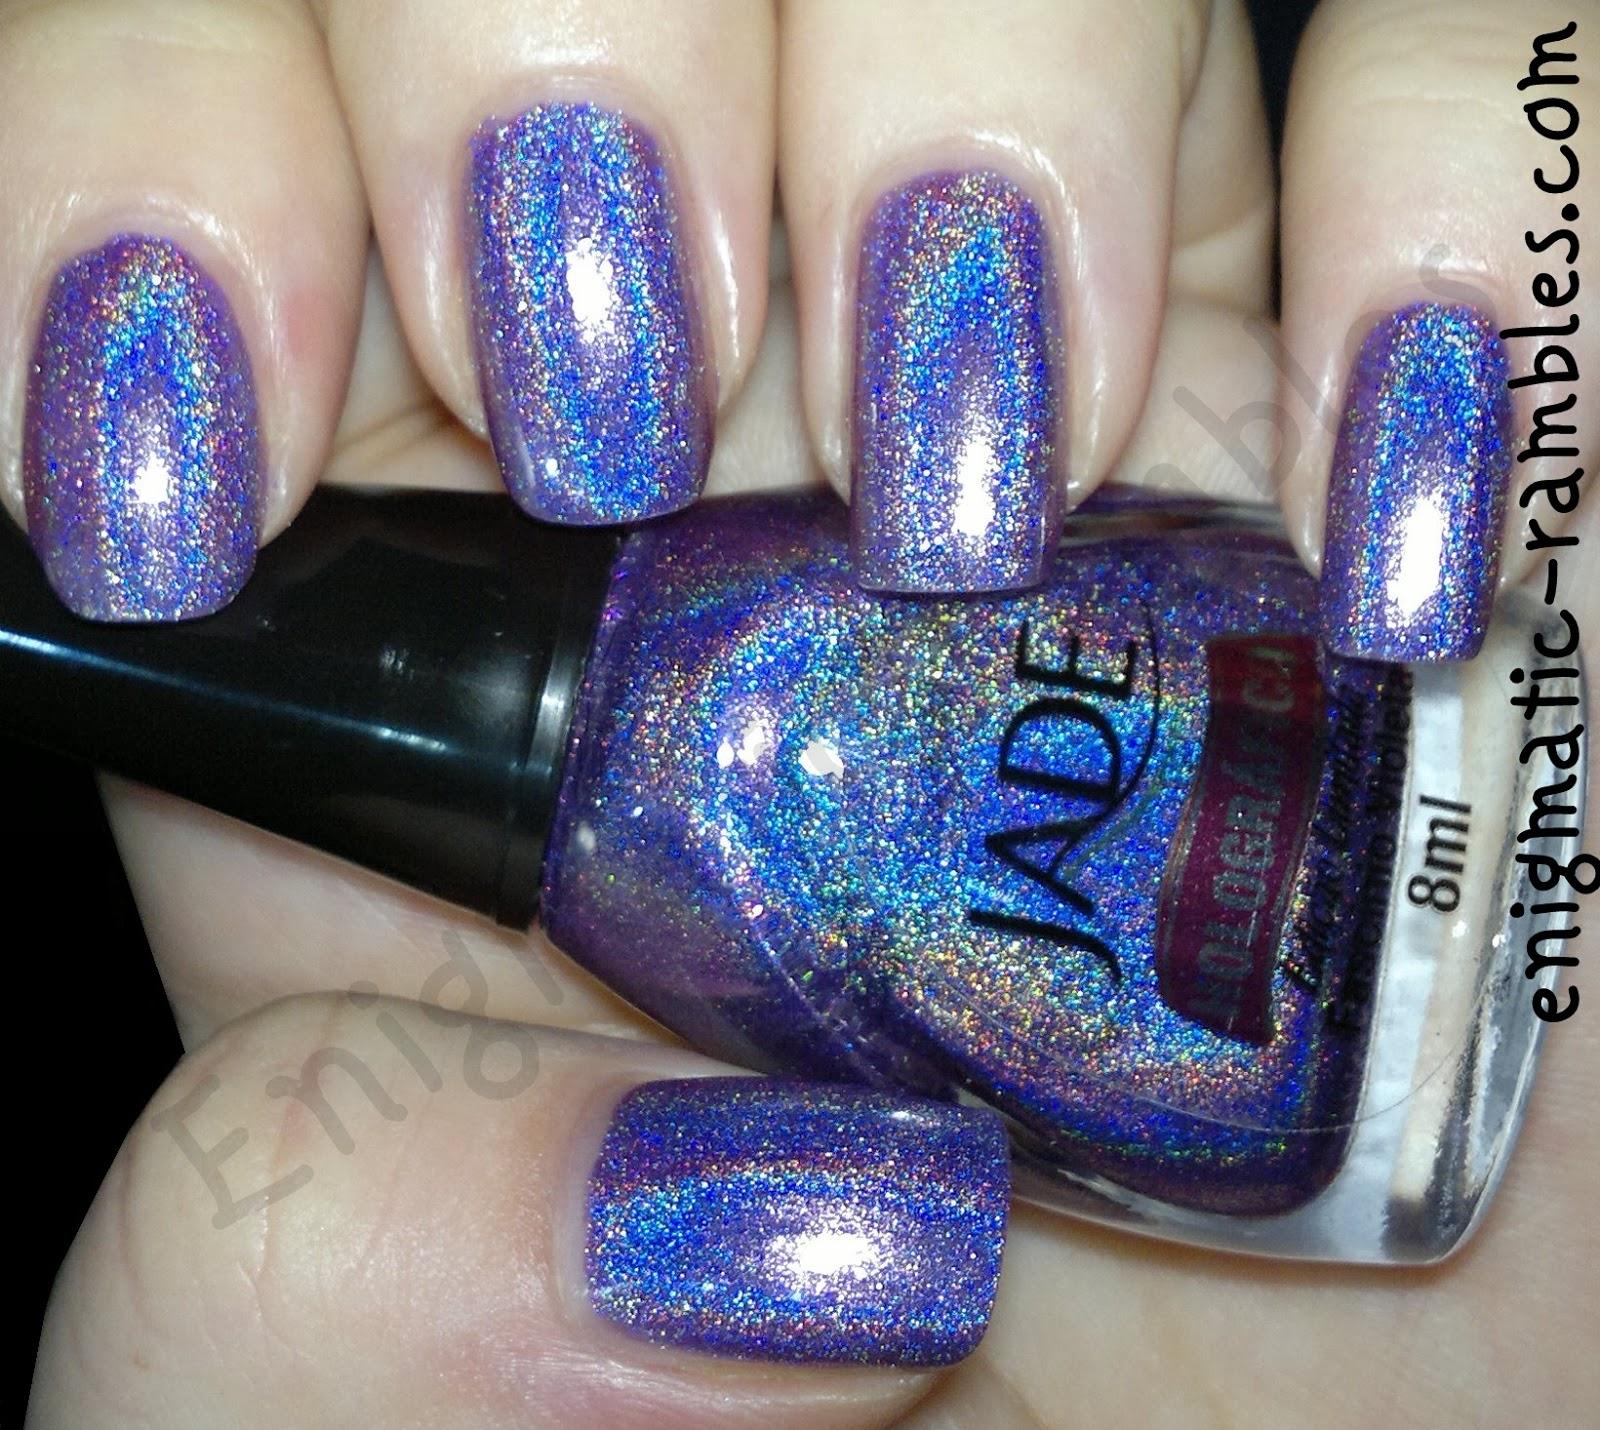 swatch-jade-fascinio-violeta-holographic